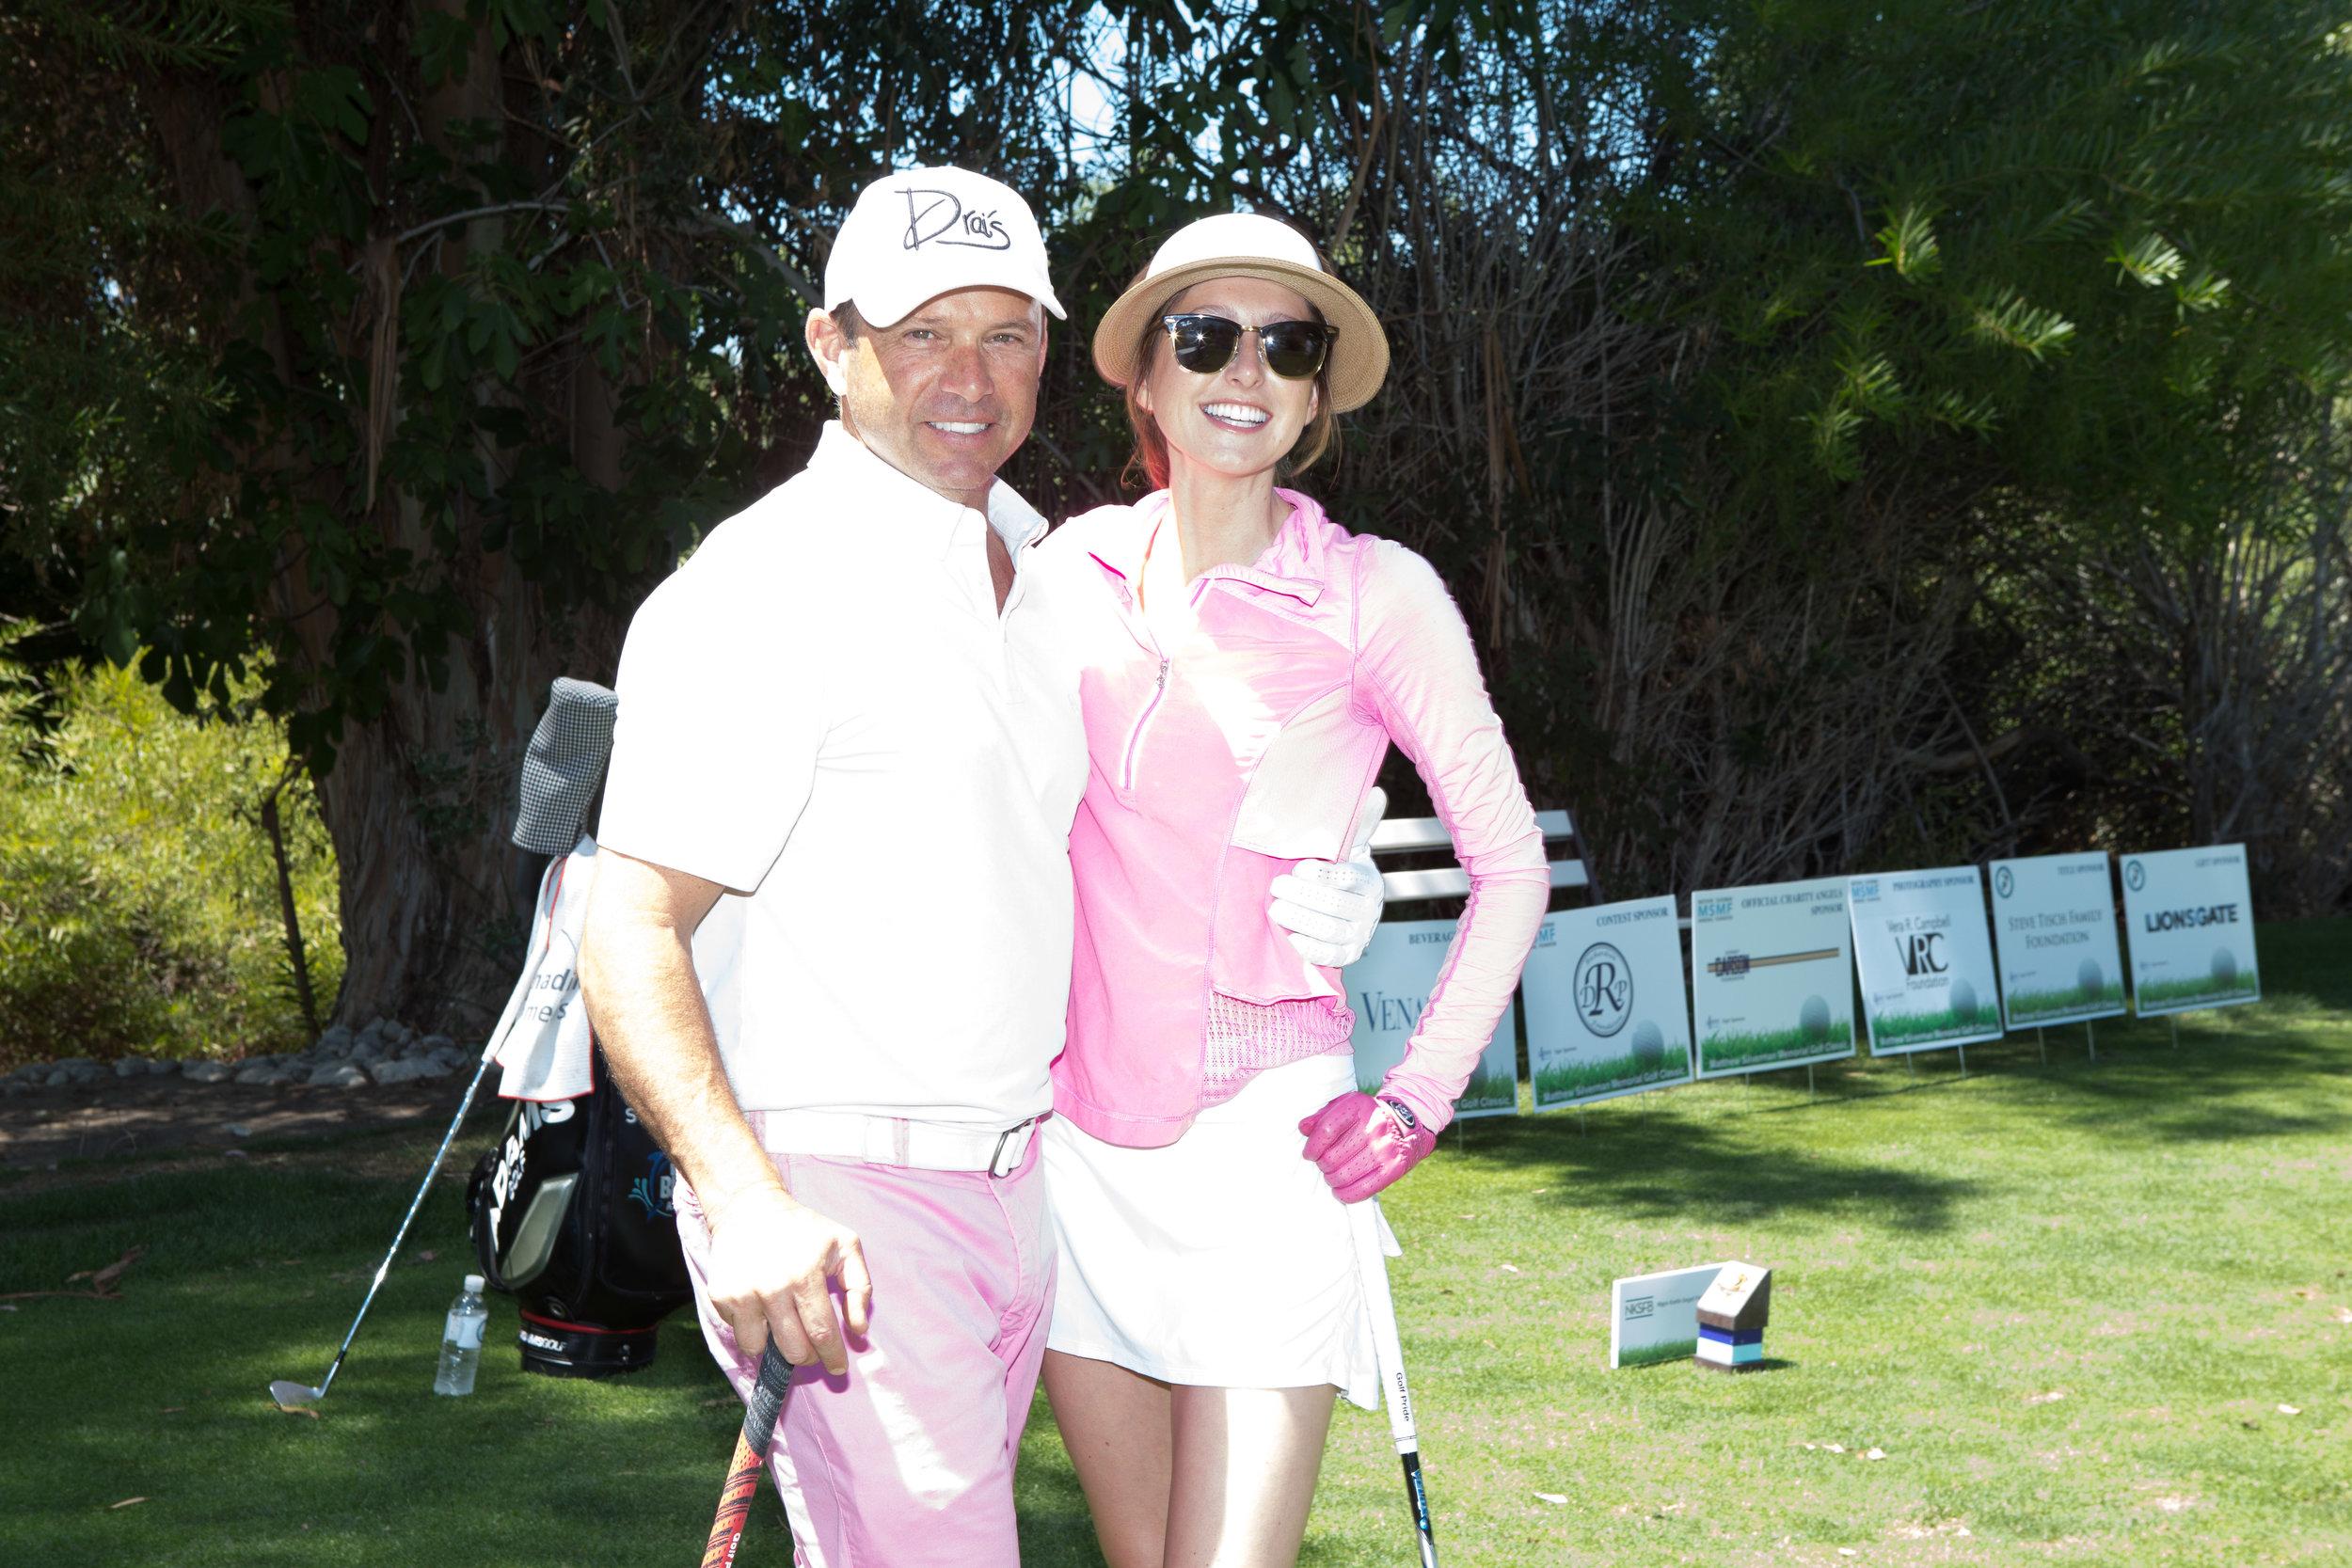 IMG_7957-golfing couple.jpg